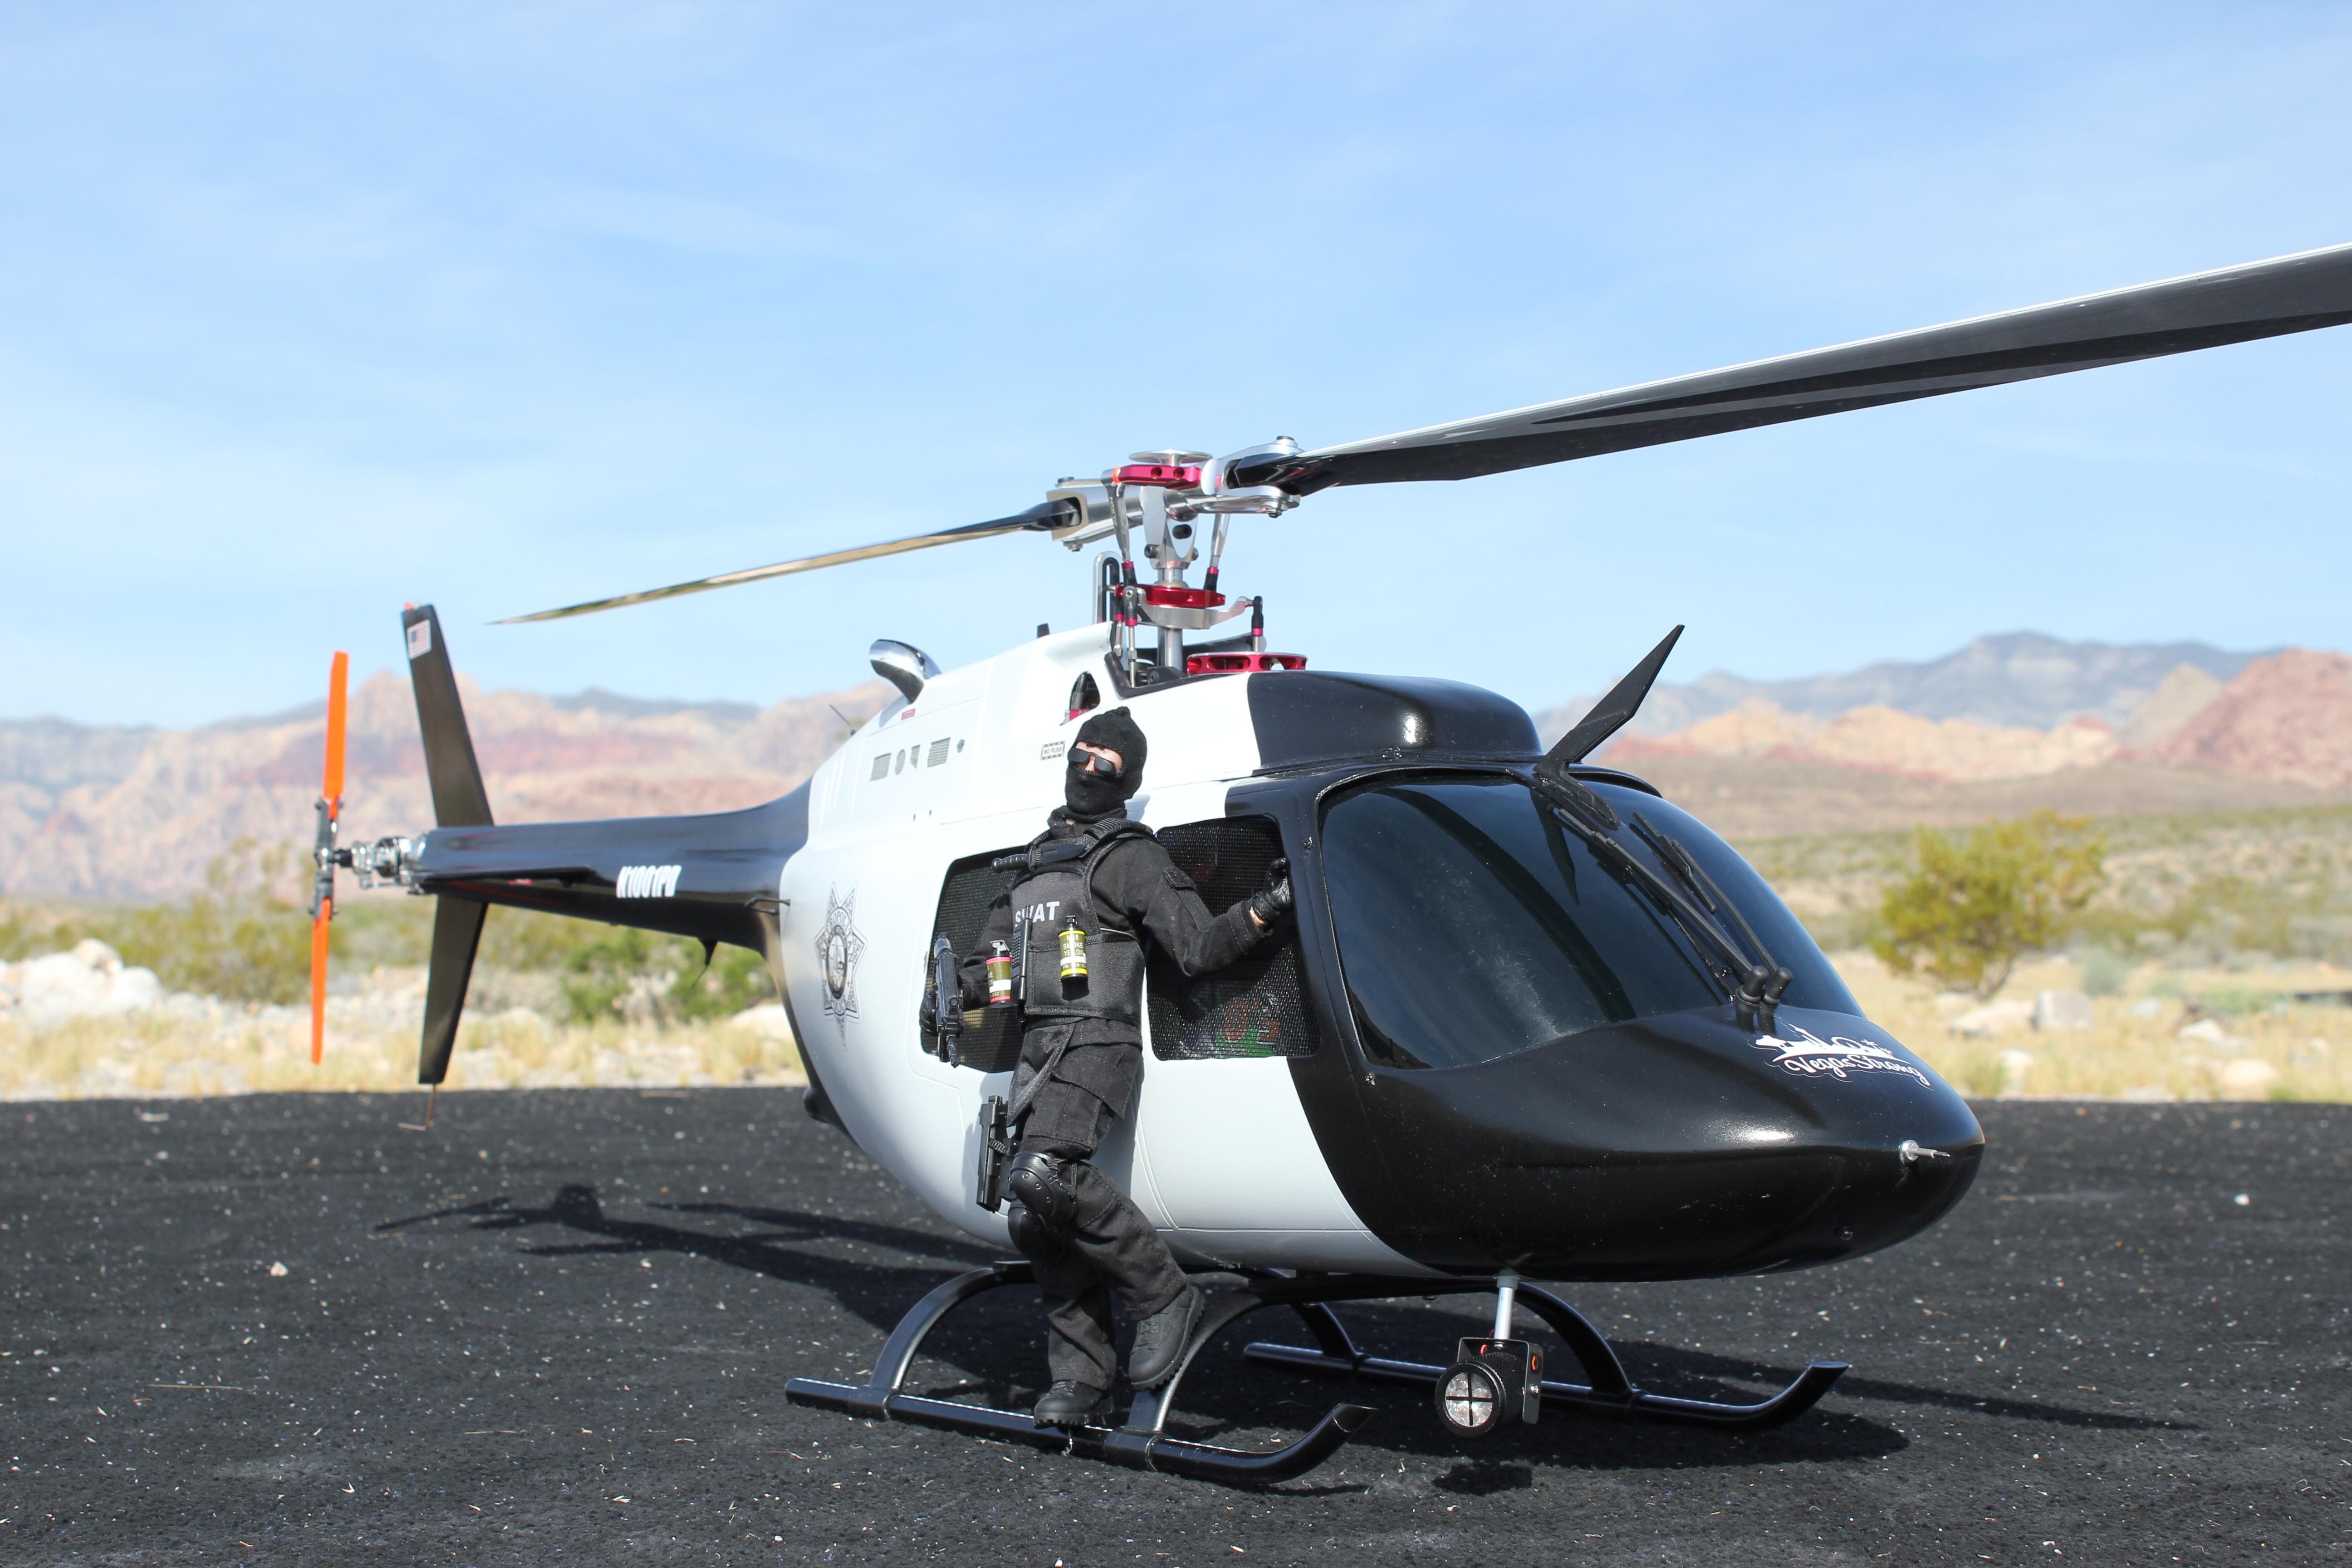 TR700 in Jet Ranger body - Las vegas Metro Police Oct 1 commemoritive